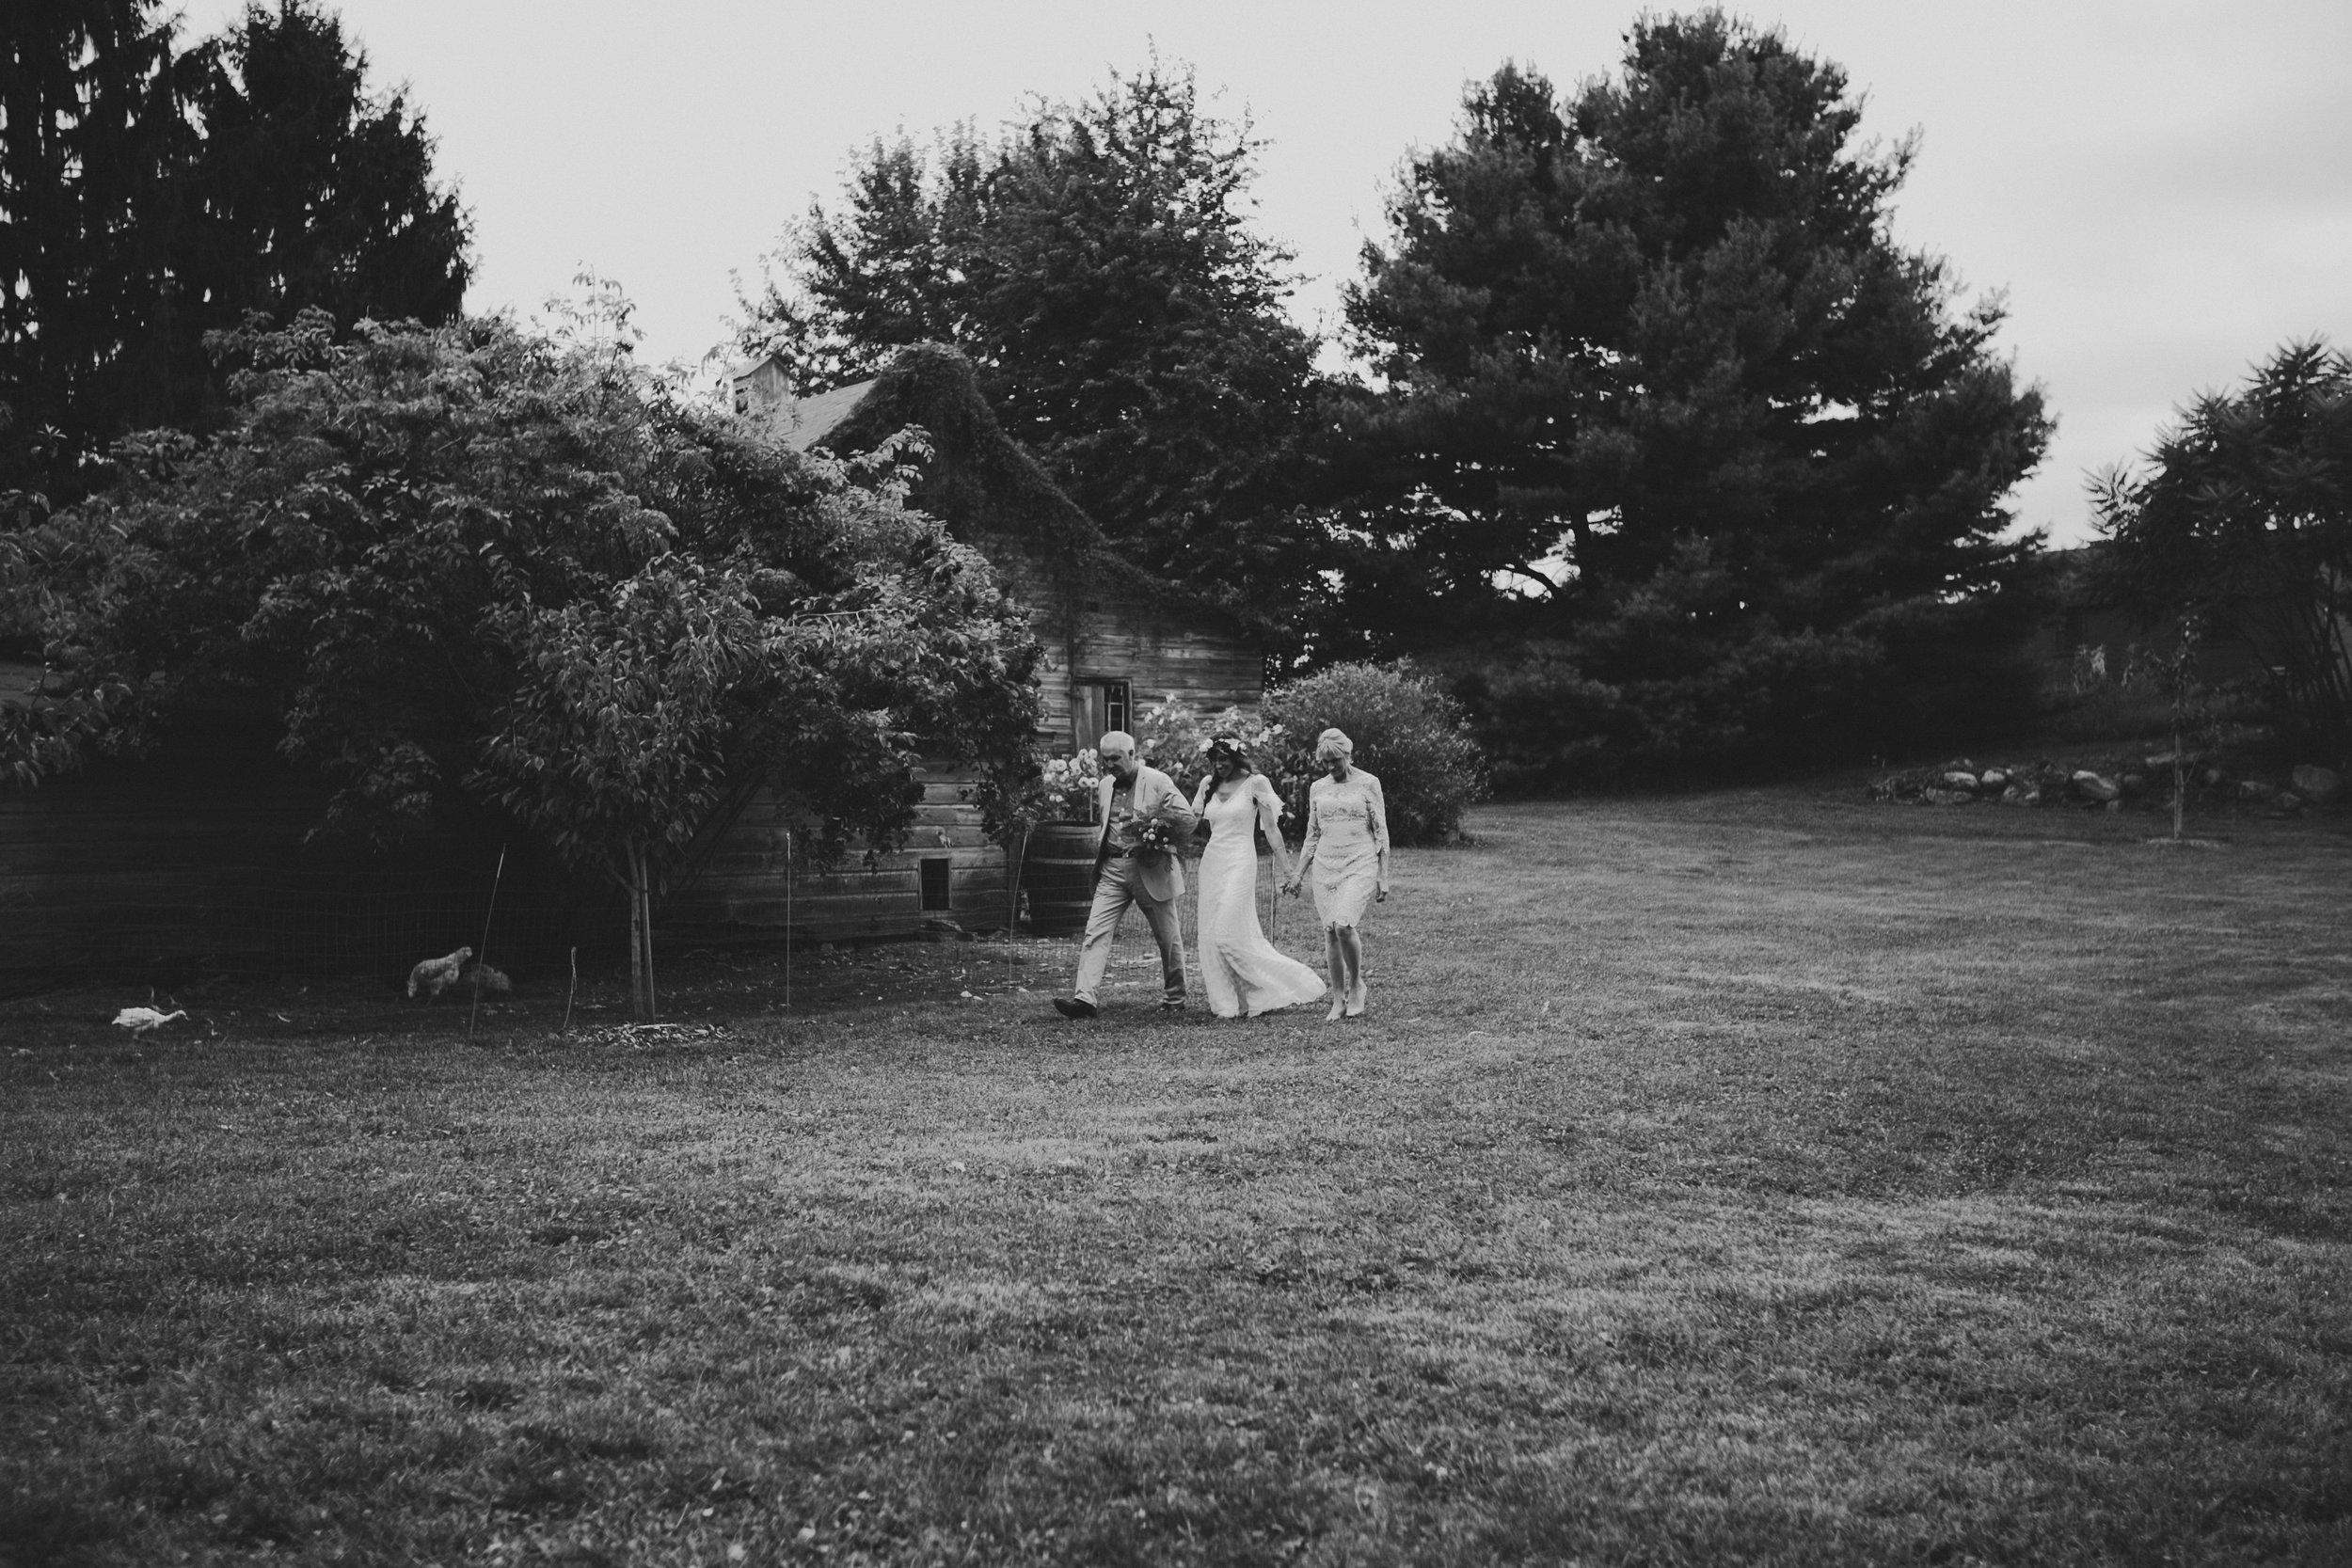 LIBERTY_VIEW_FARM_HIGHLAND_NY_WEDDING_CHELLISE_MICHAEL_PHOTOGRAPHY828.JPG